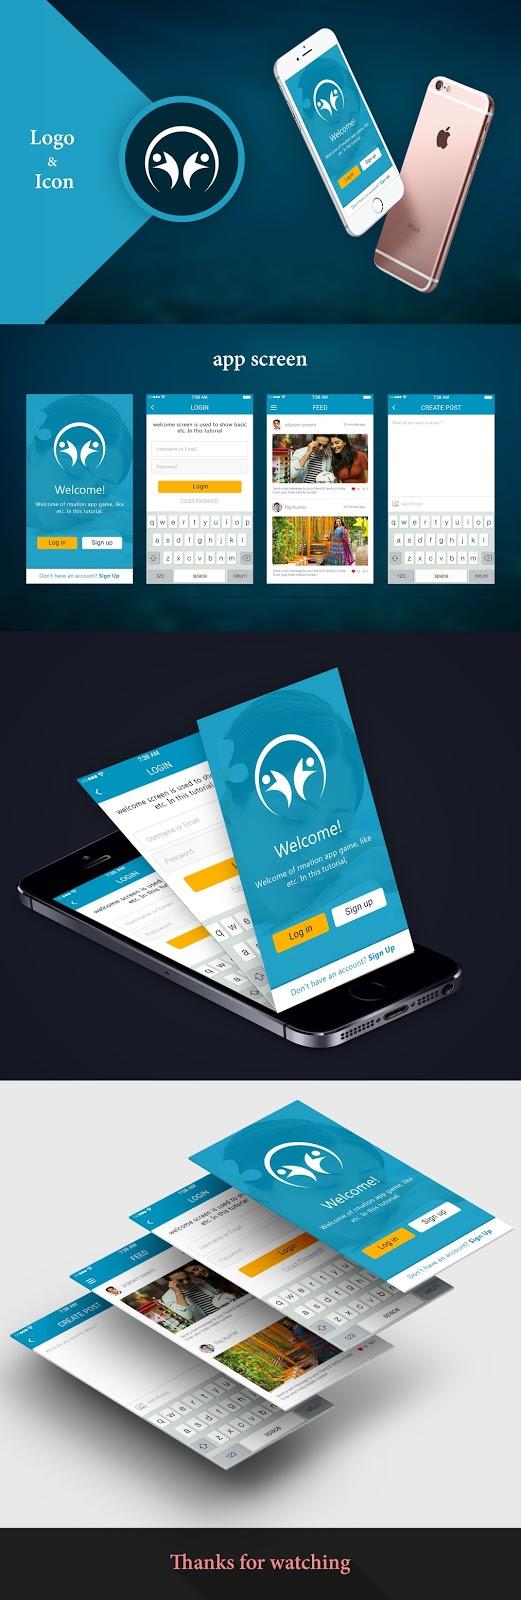 फोटोशॉप Mobile Apps डिज़ाइन